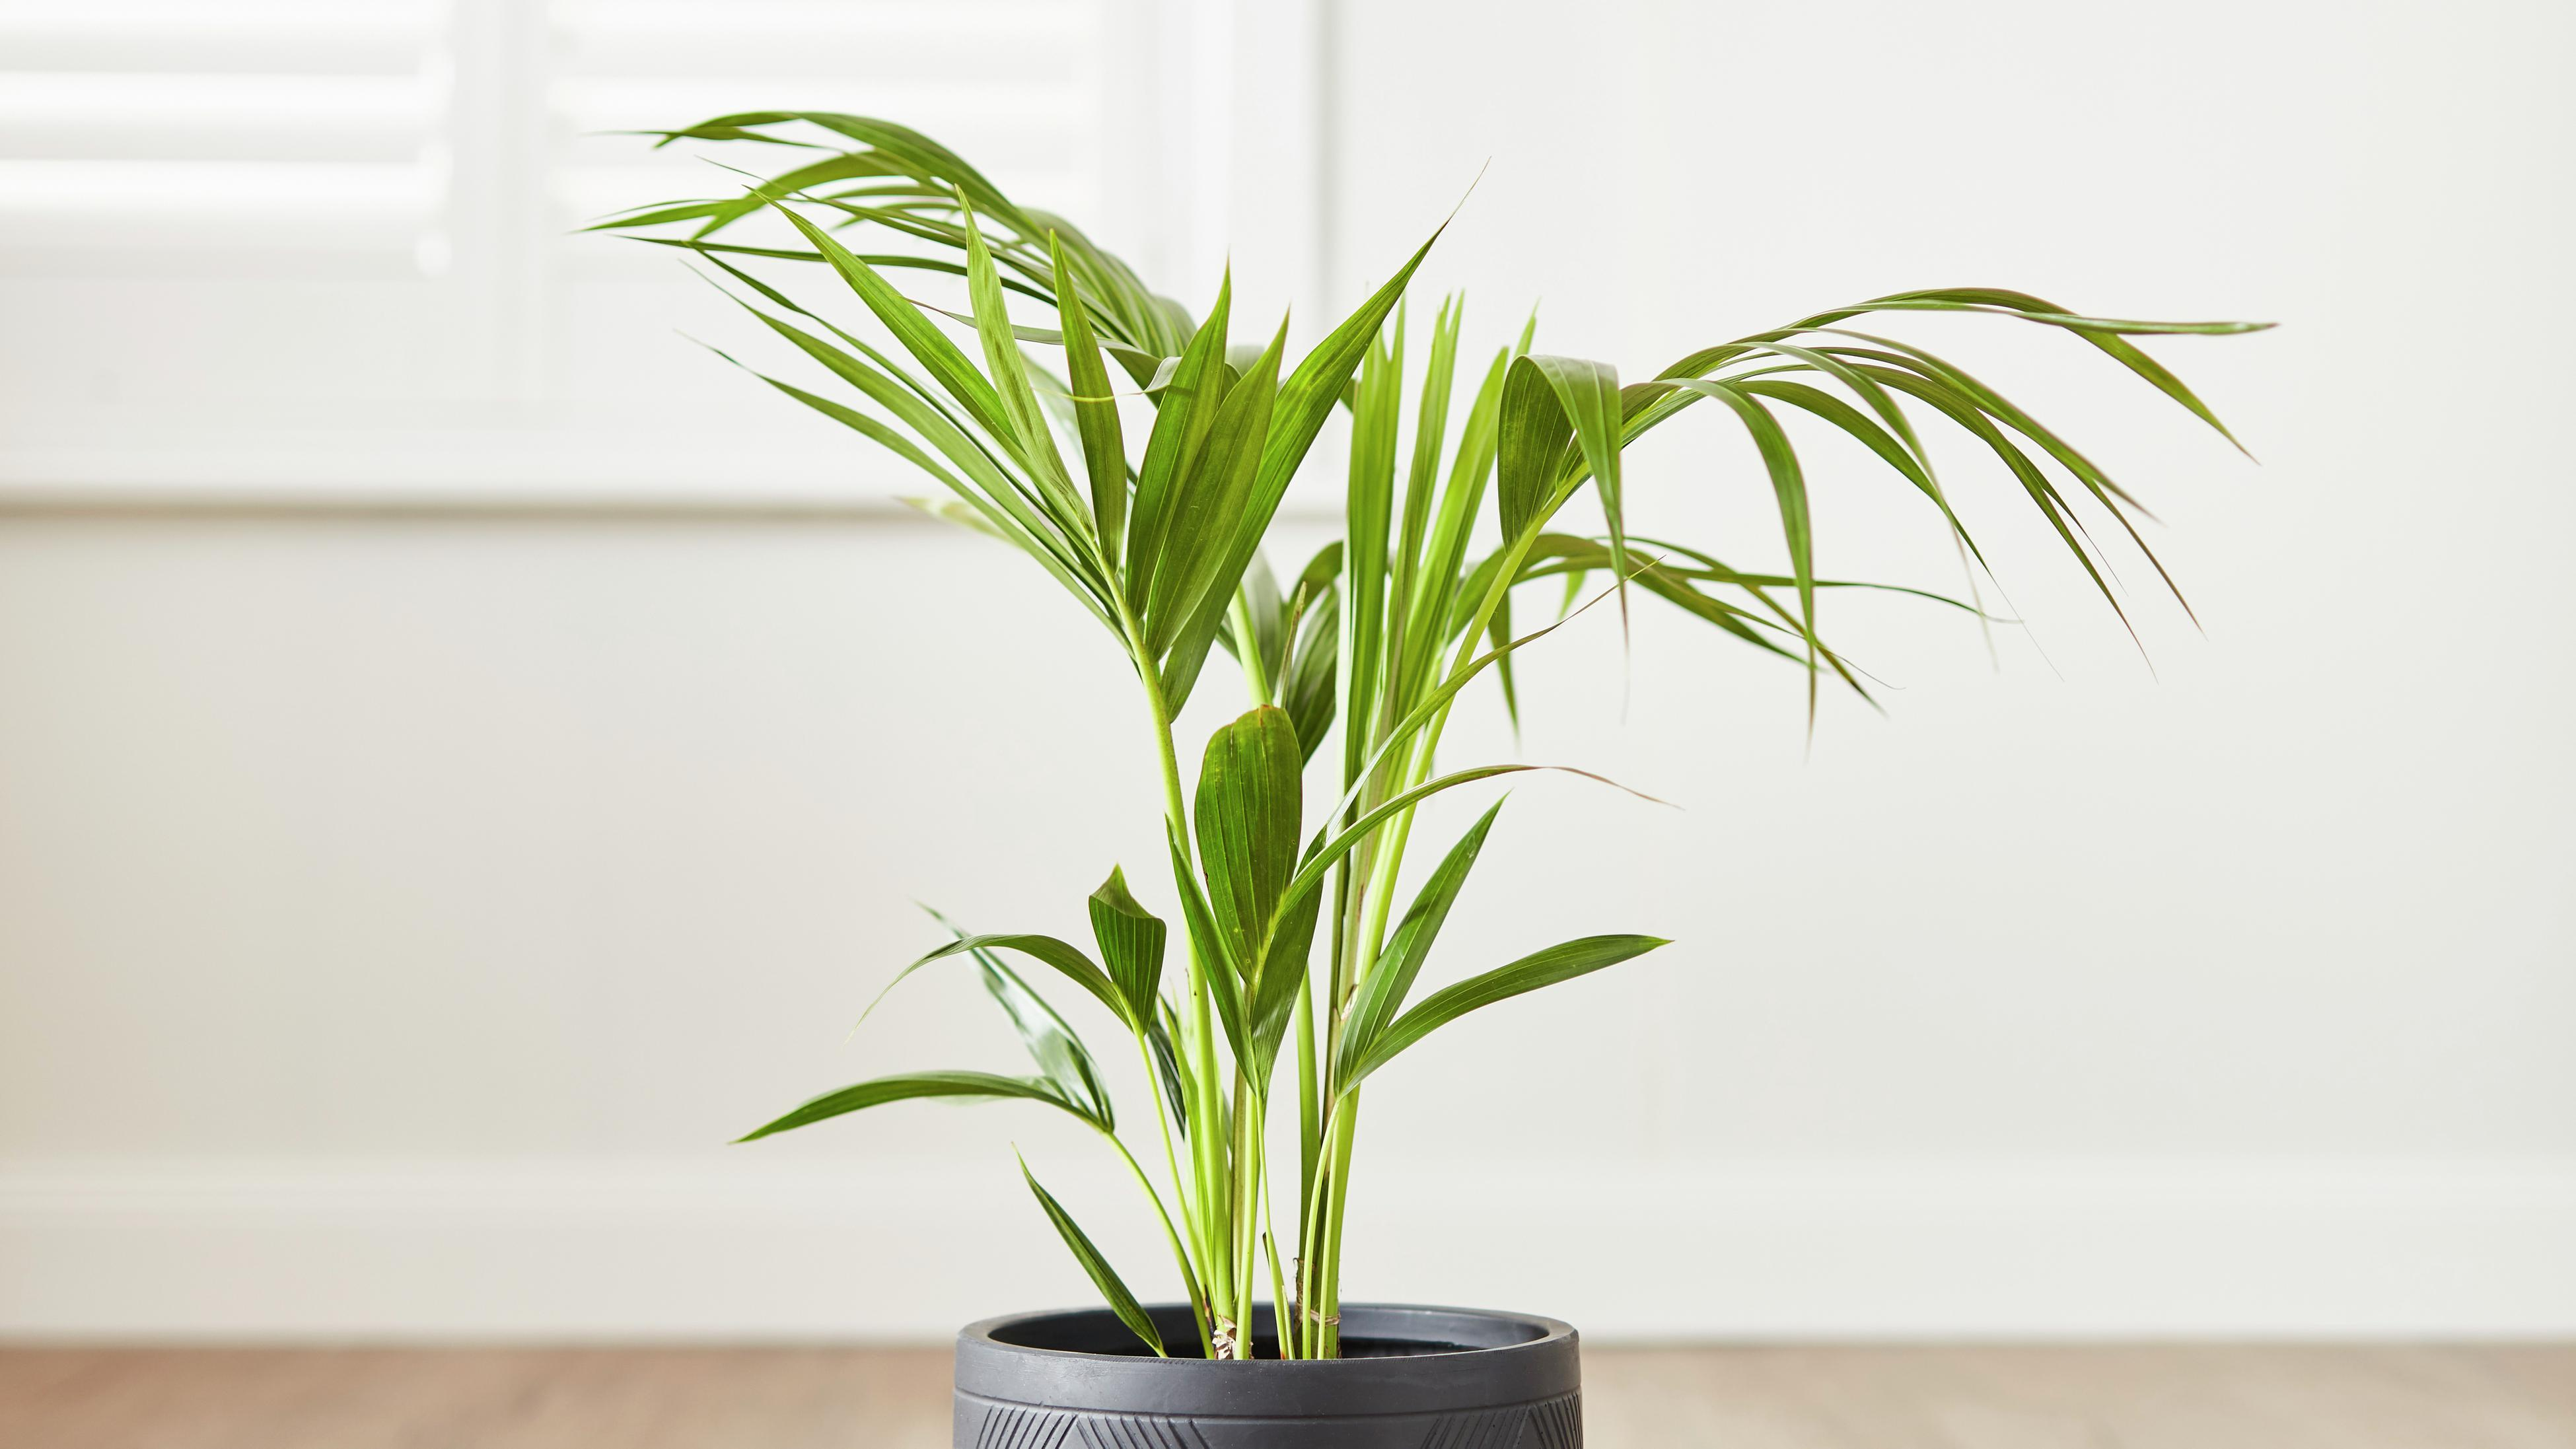 The Rhapis palm in a black pot.